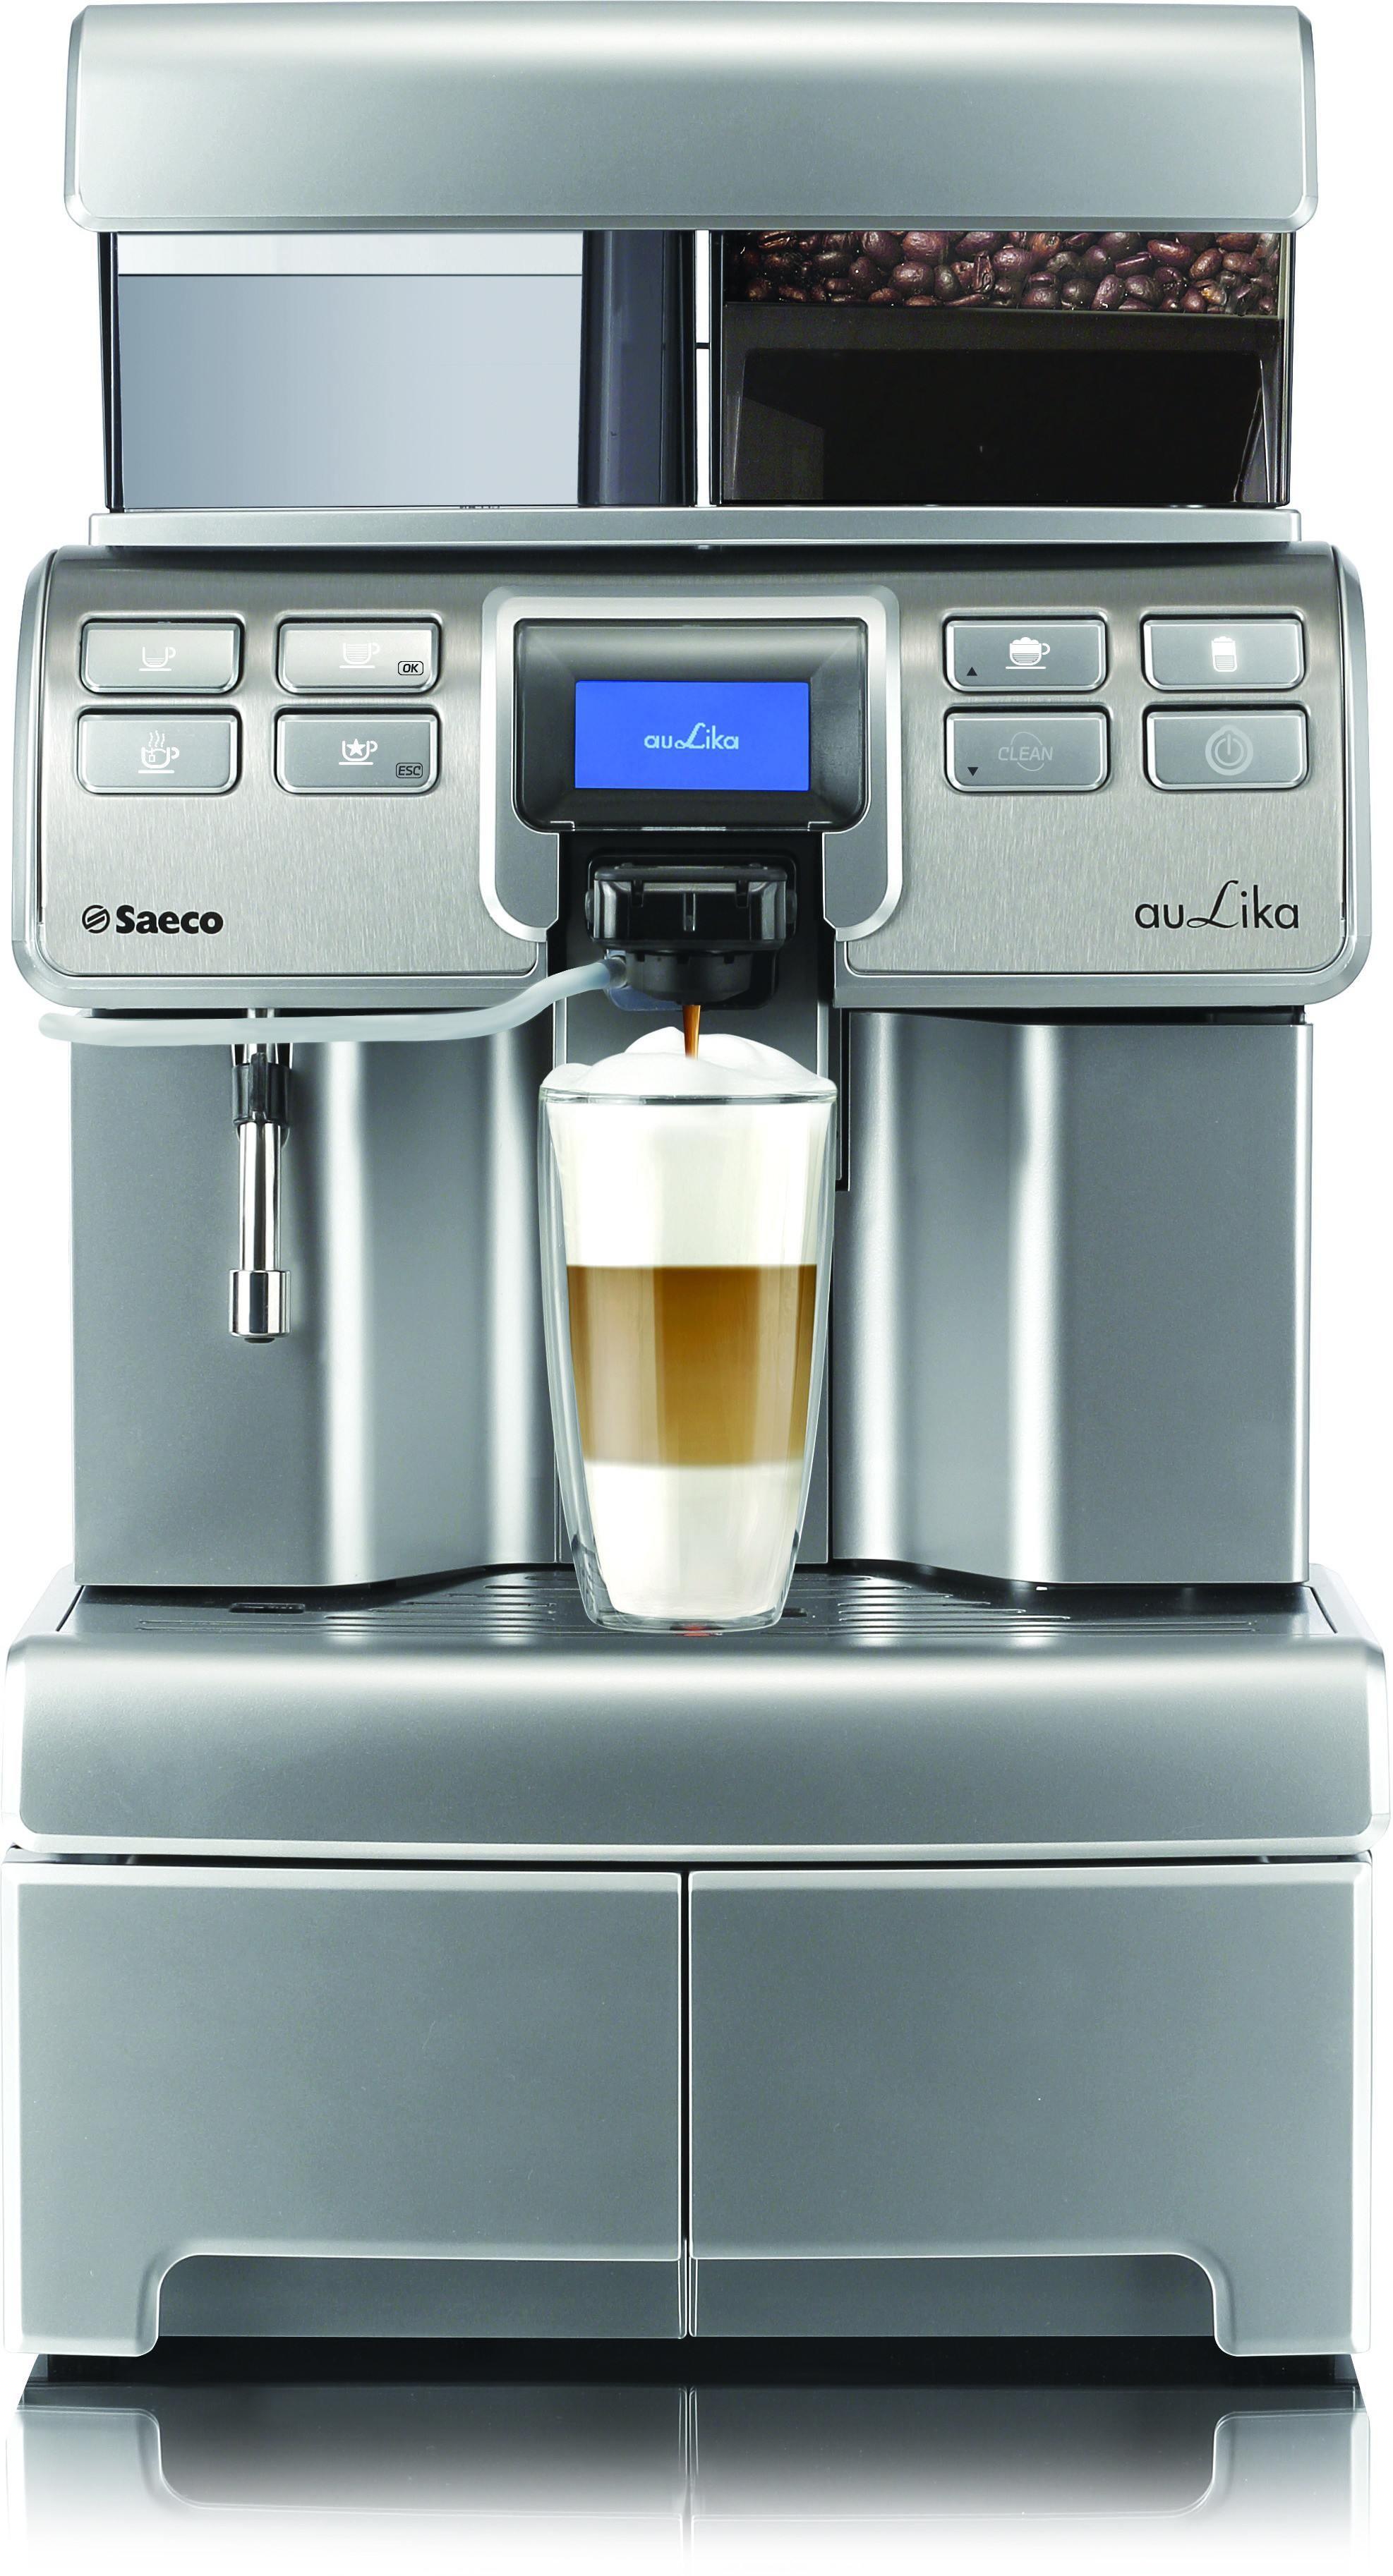 Saeco Aulika Top High Speed Cappuccino Coffee Machine 25 Cups Coffee Maker(Silver)